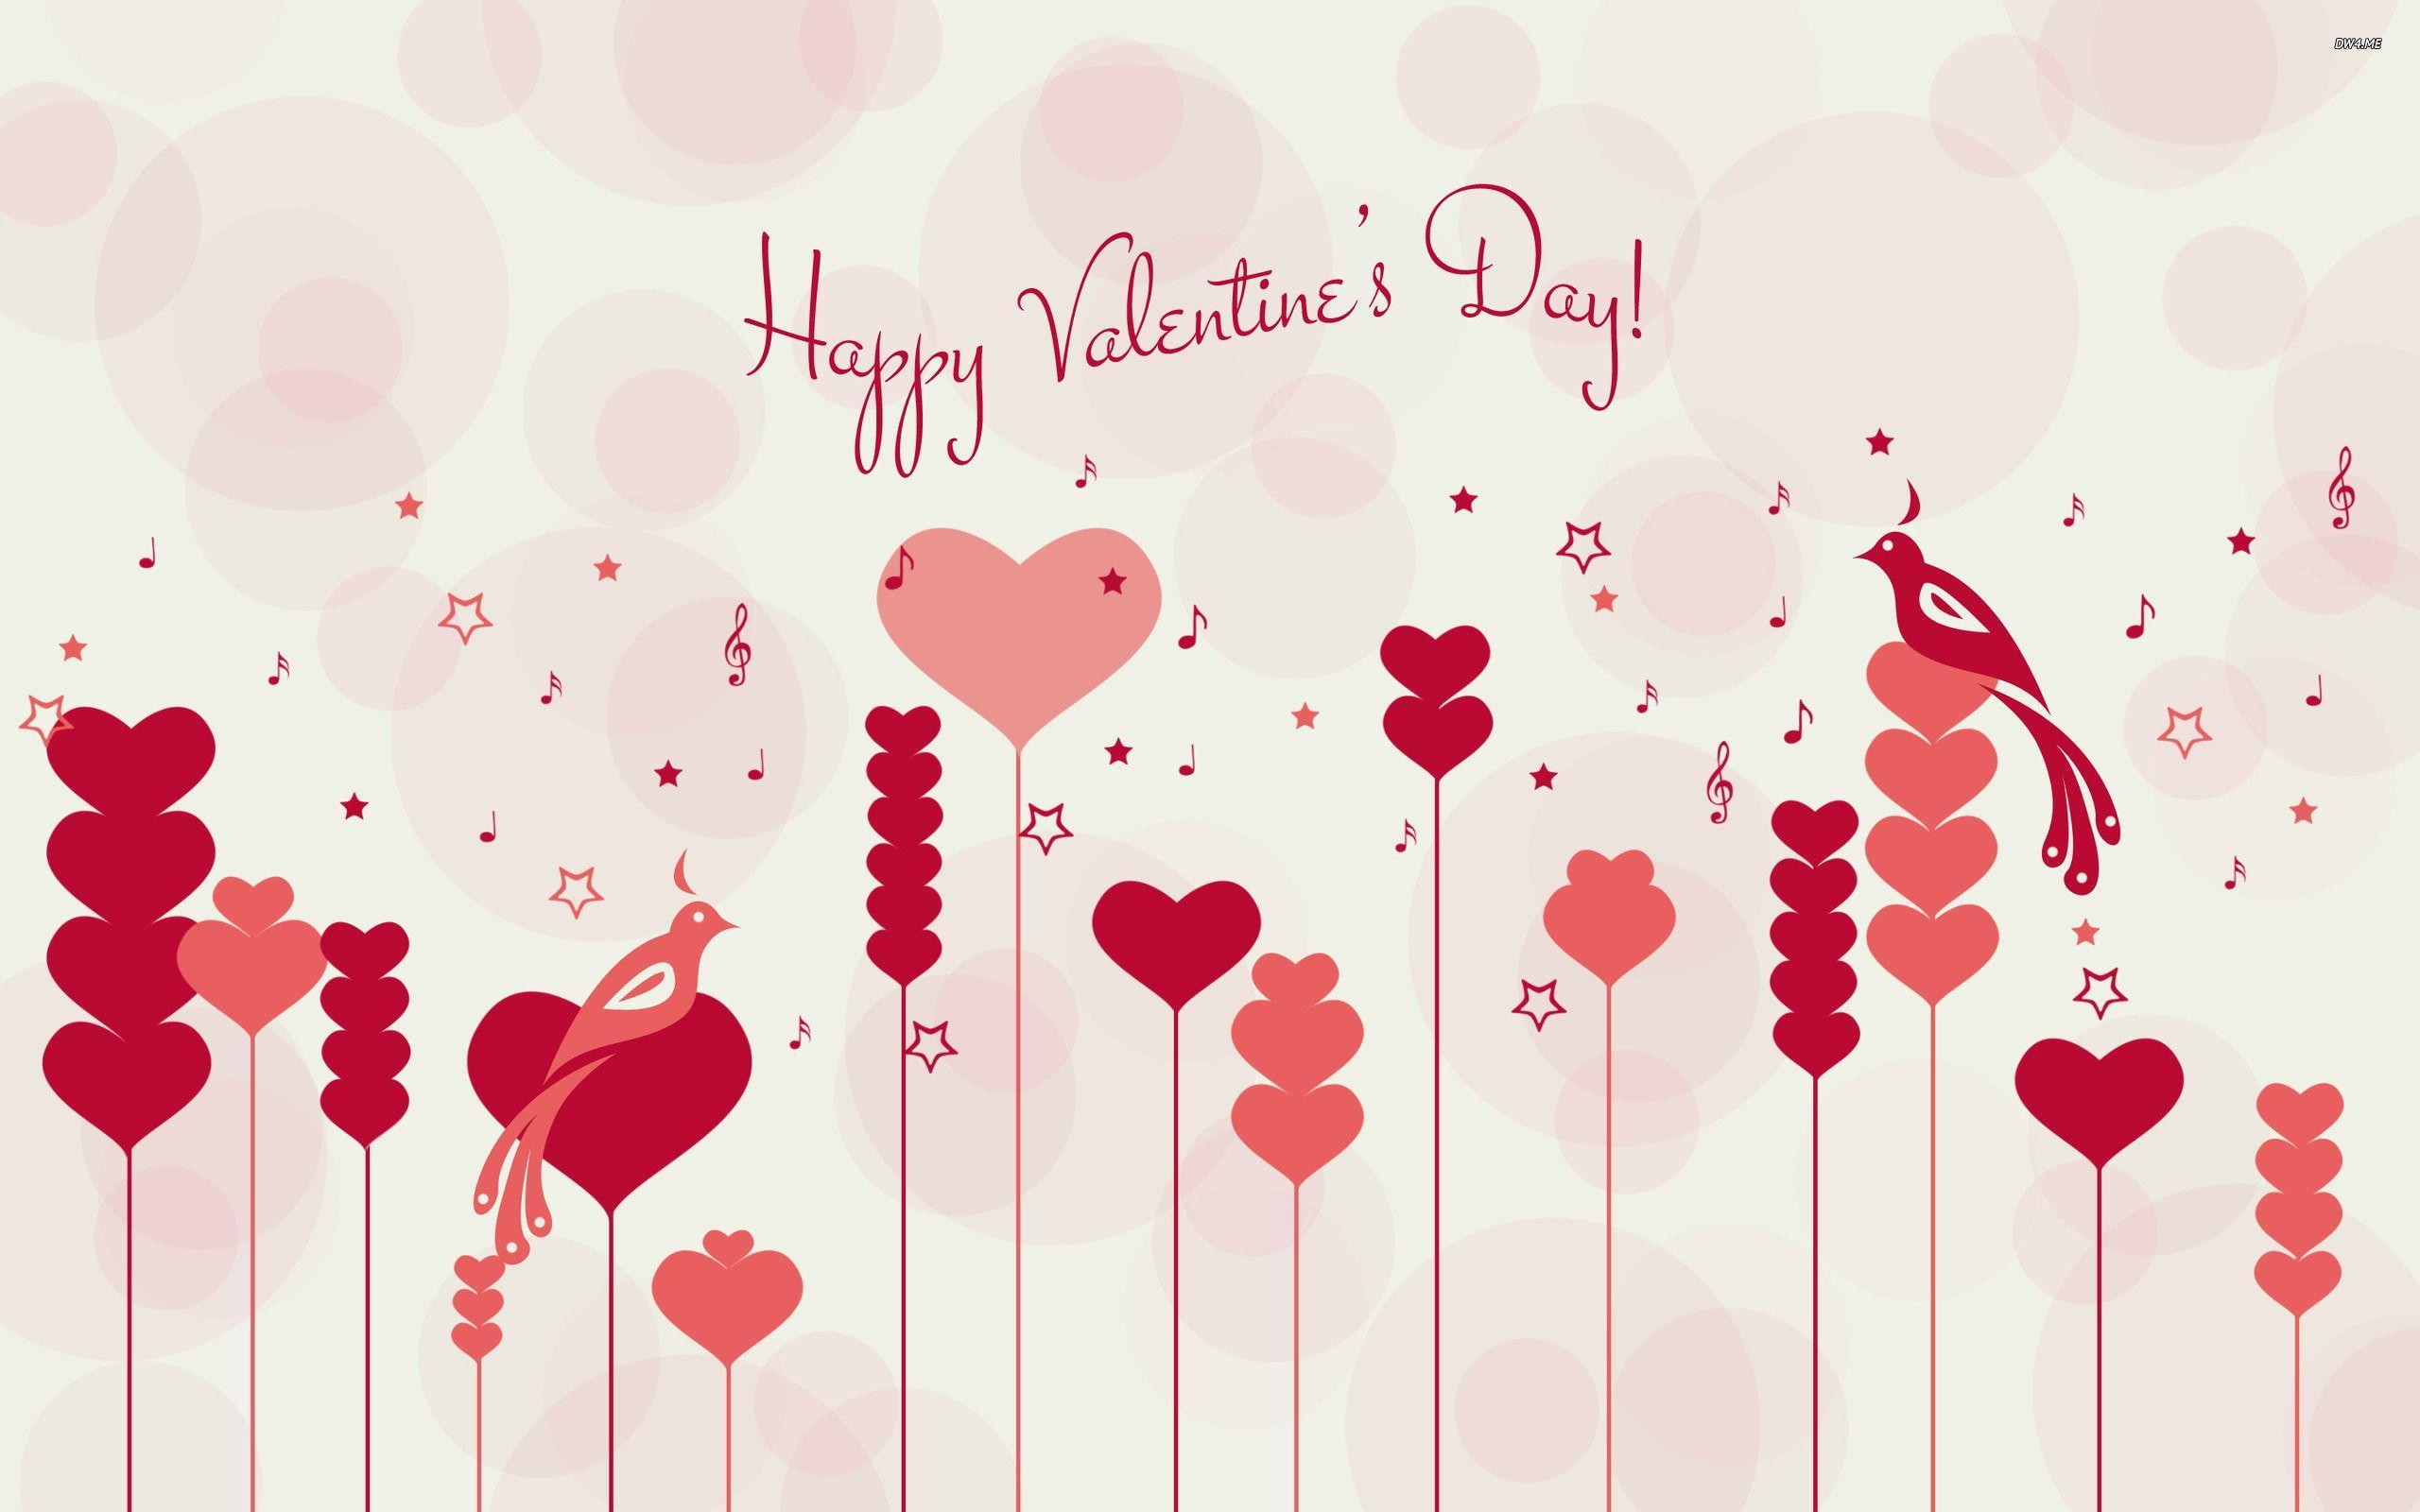 2560x1600 HDQ Valentine Day Wallpaper, Popular Photo – Wallpaper